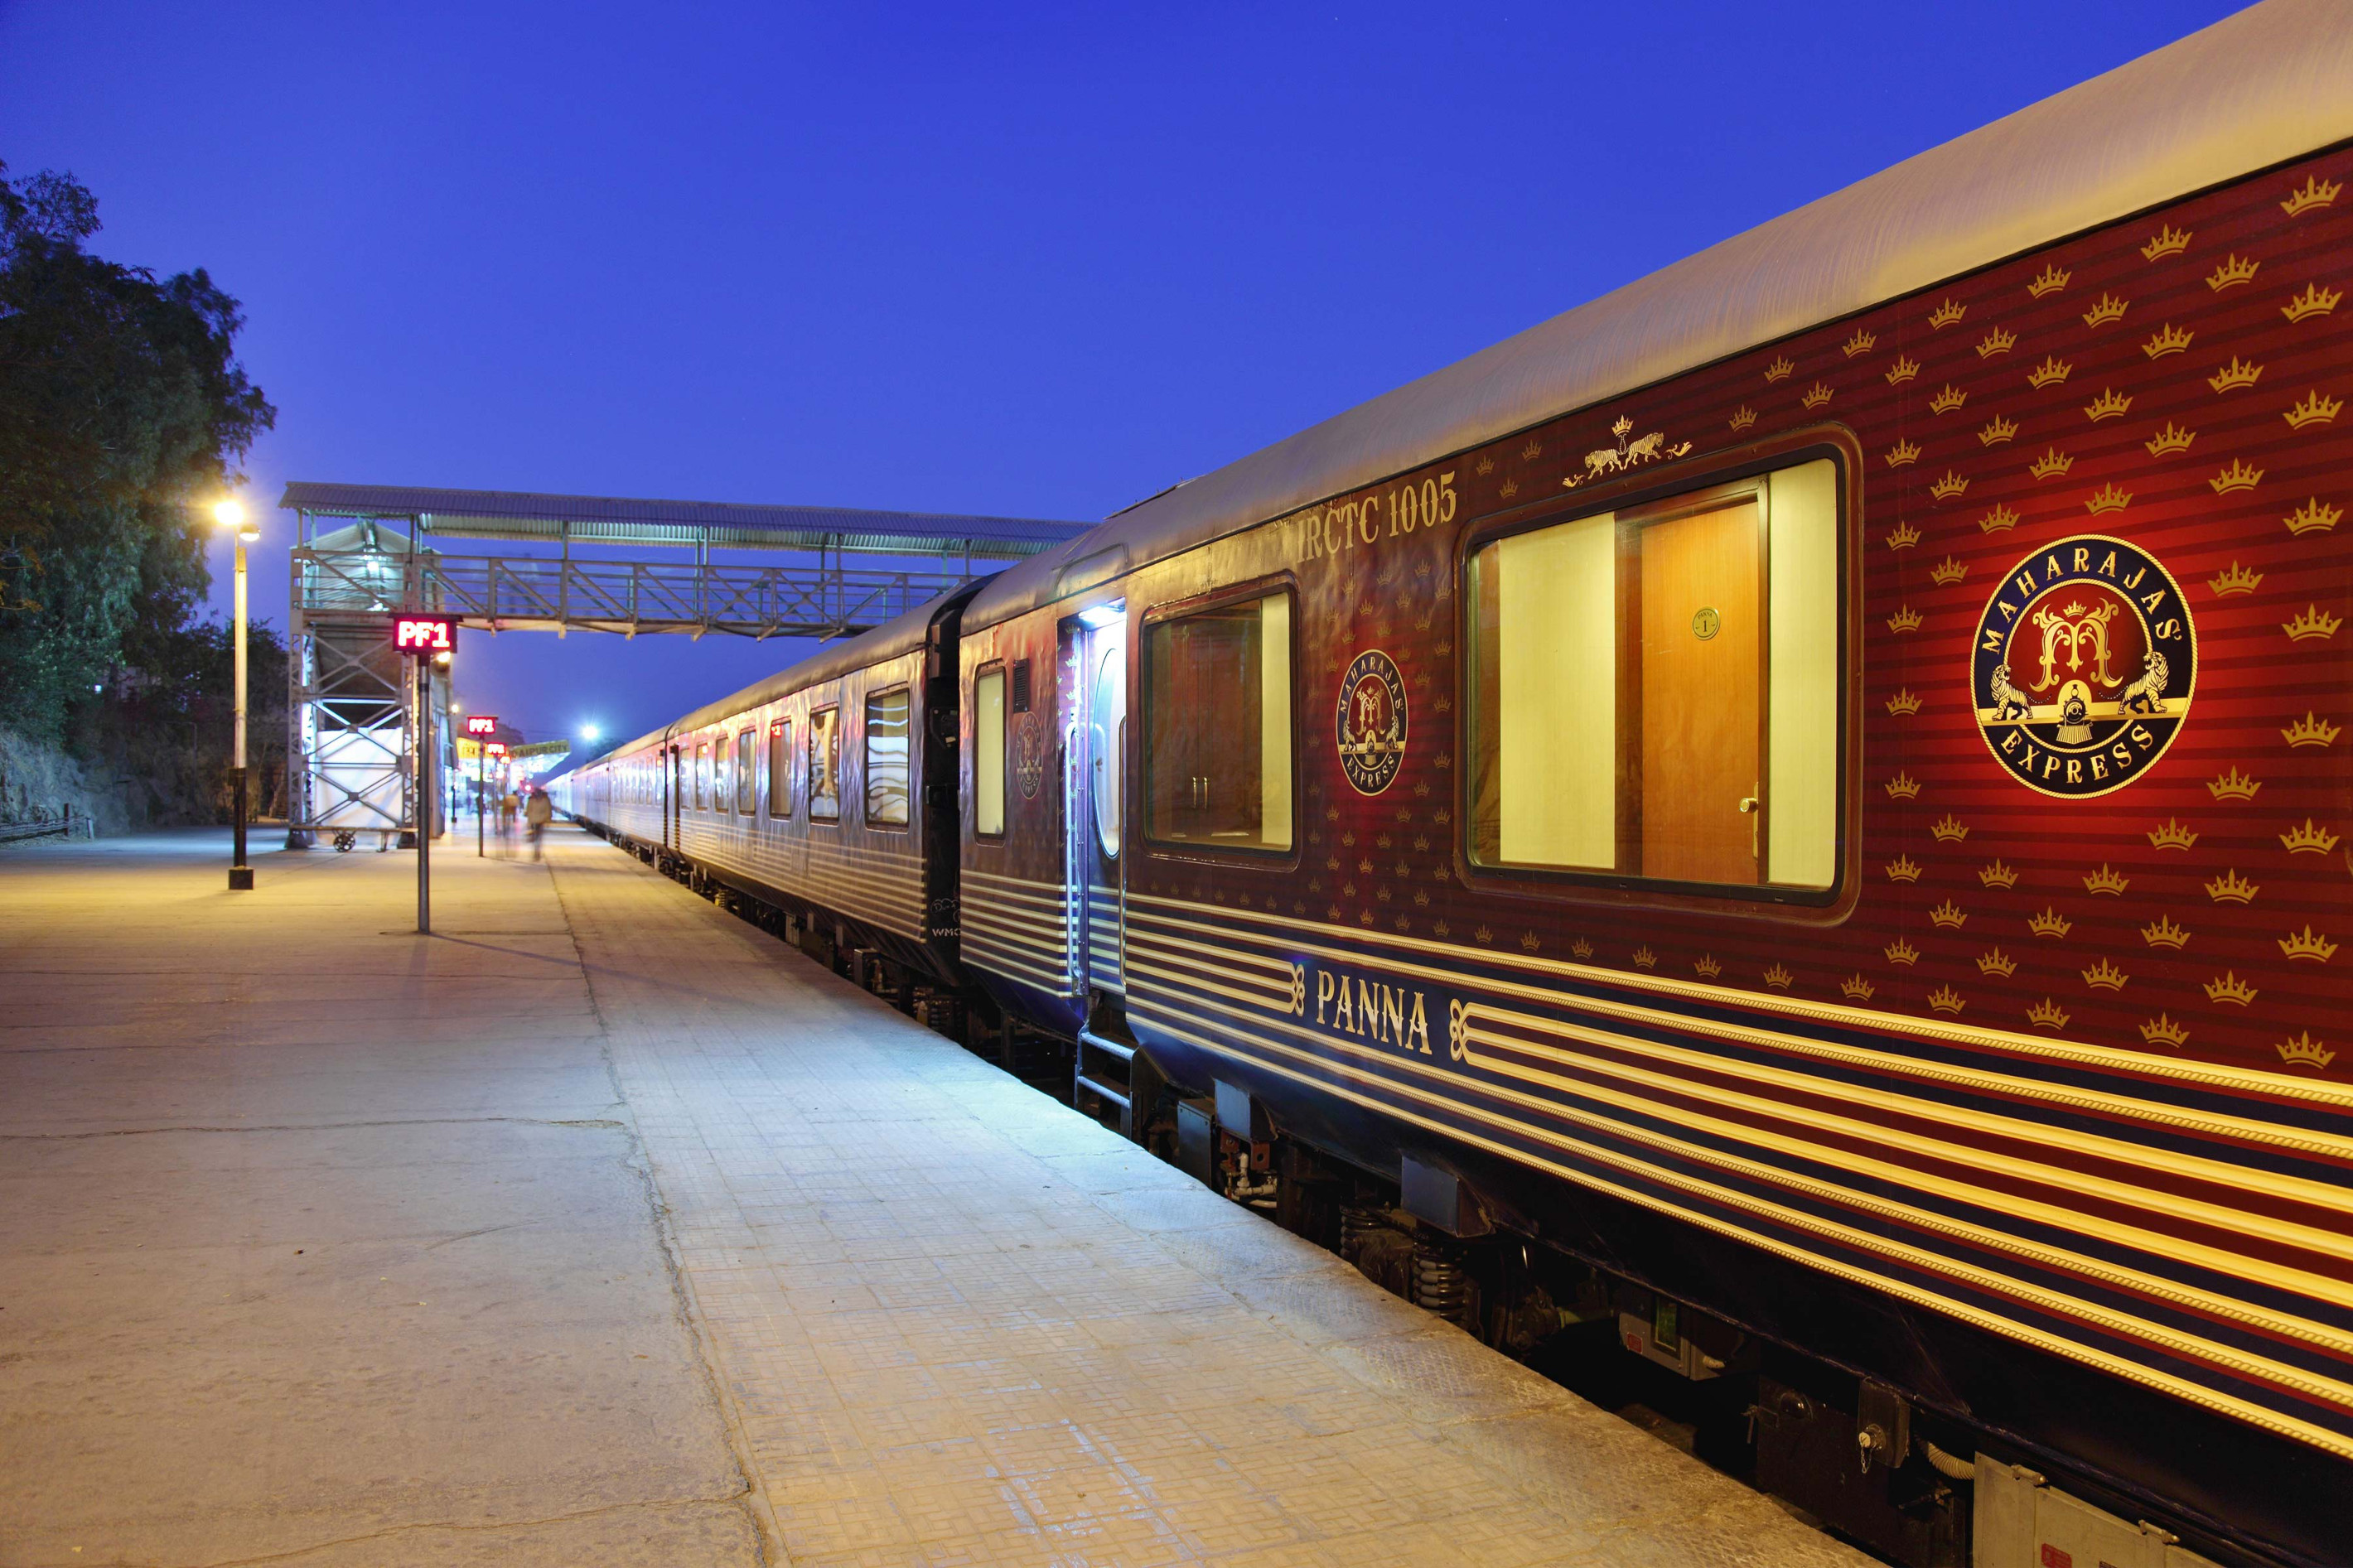 The World famous Maharaja Express